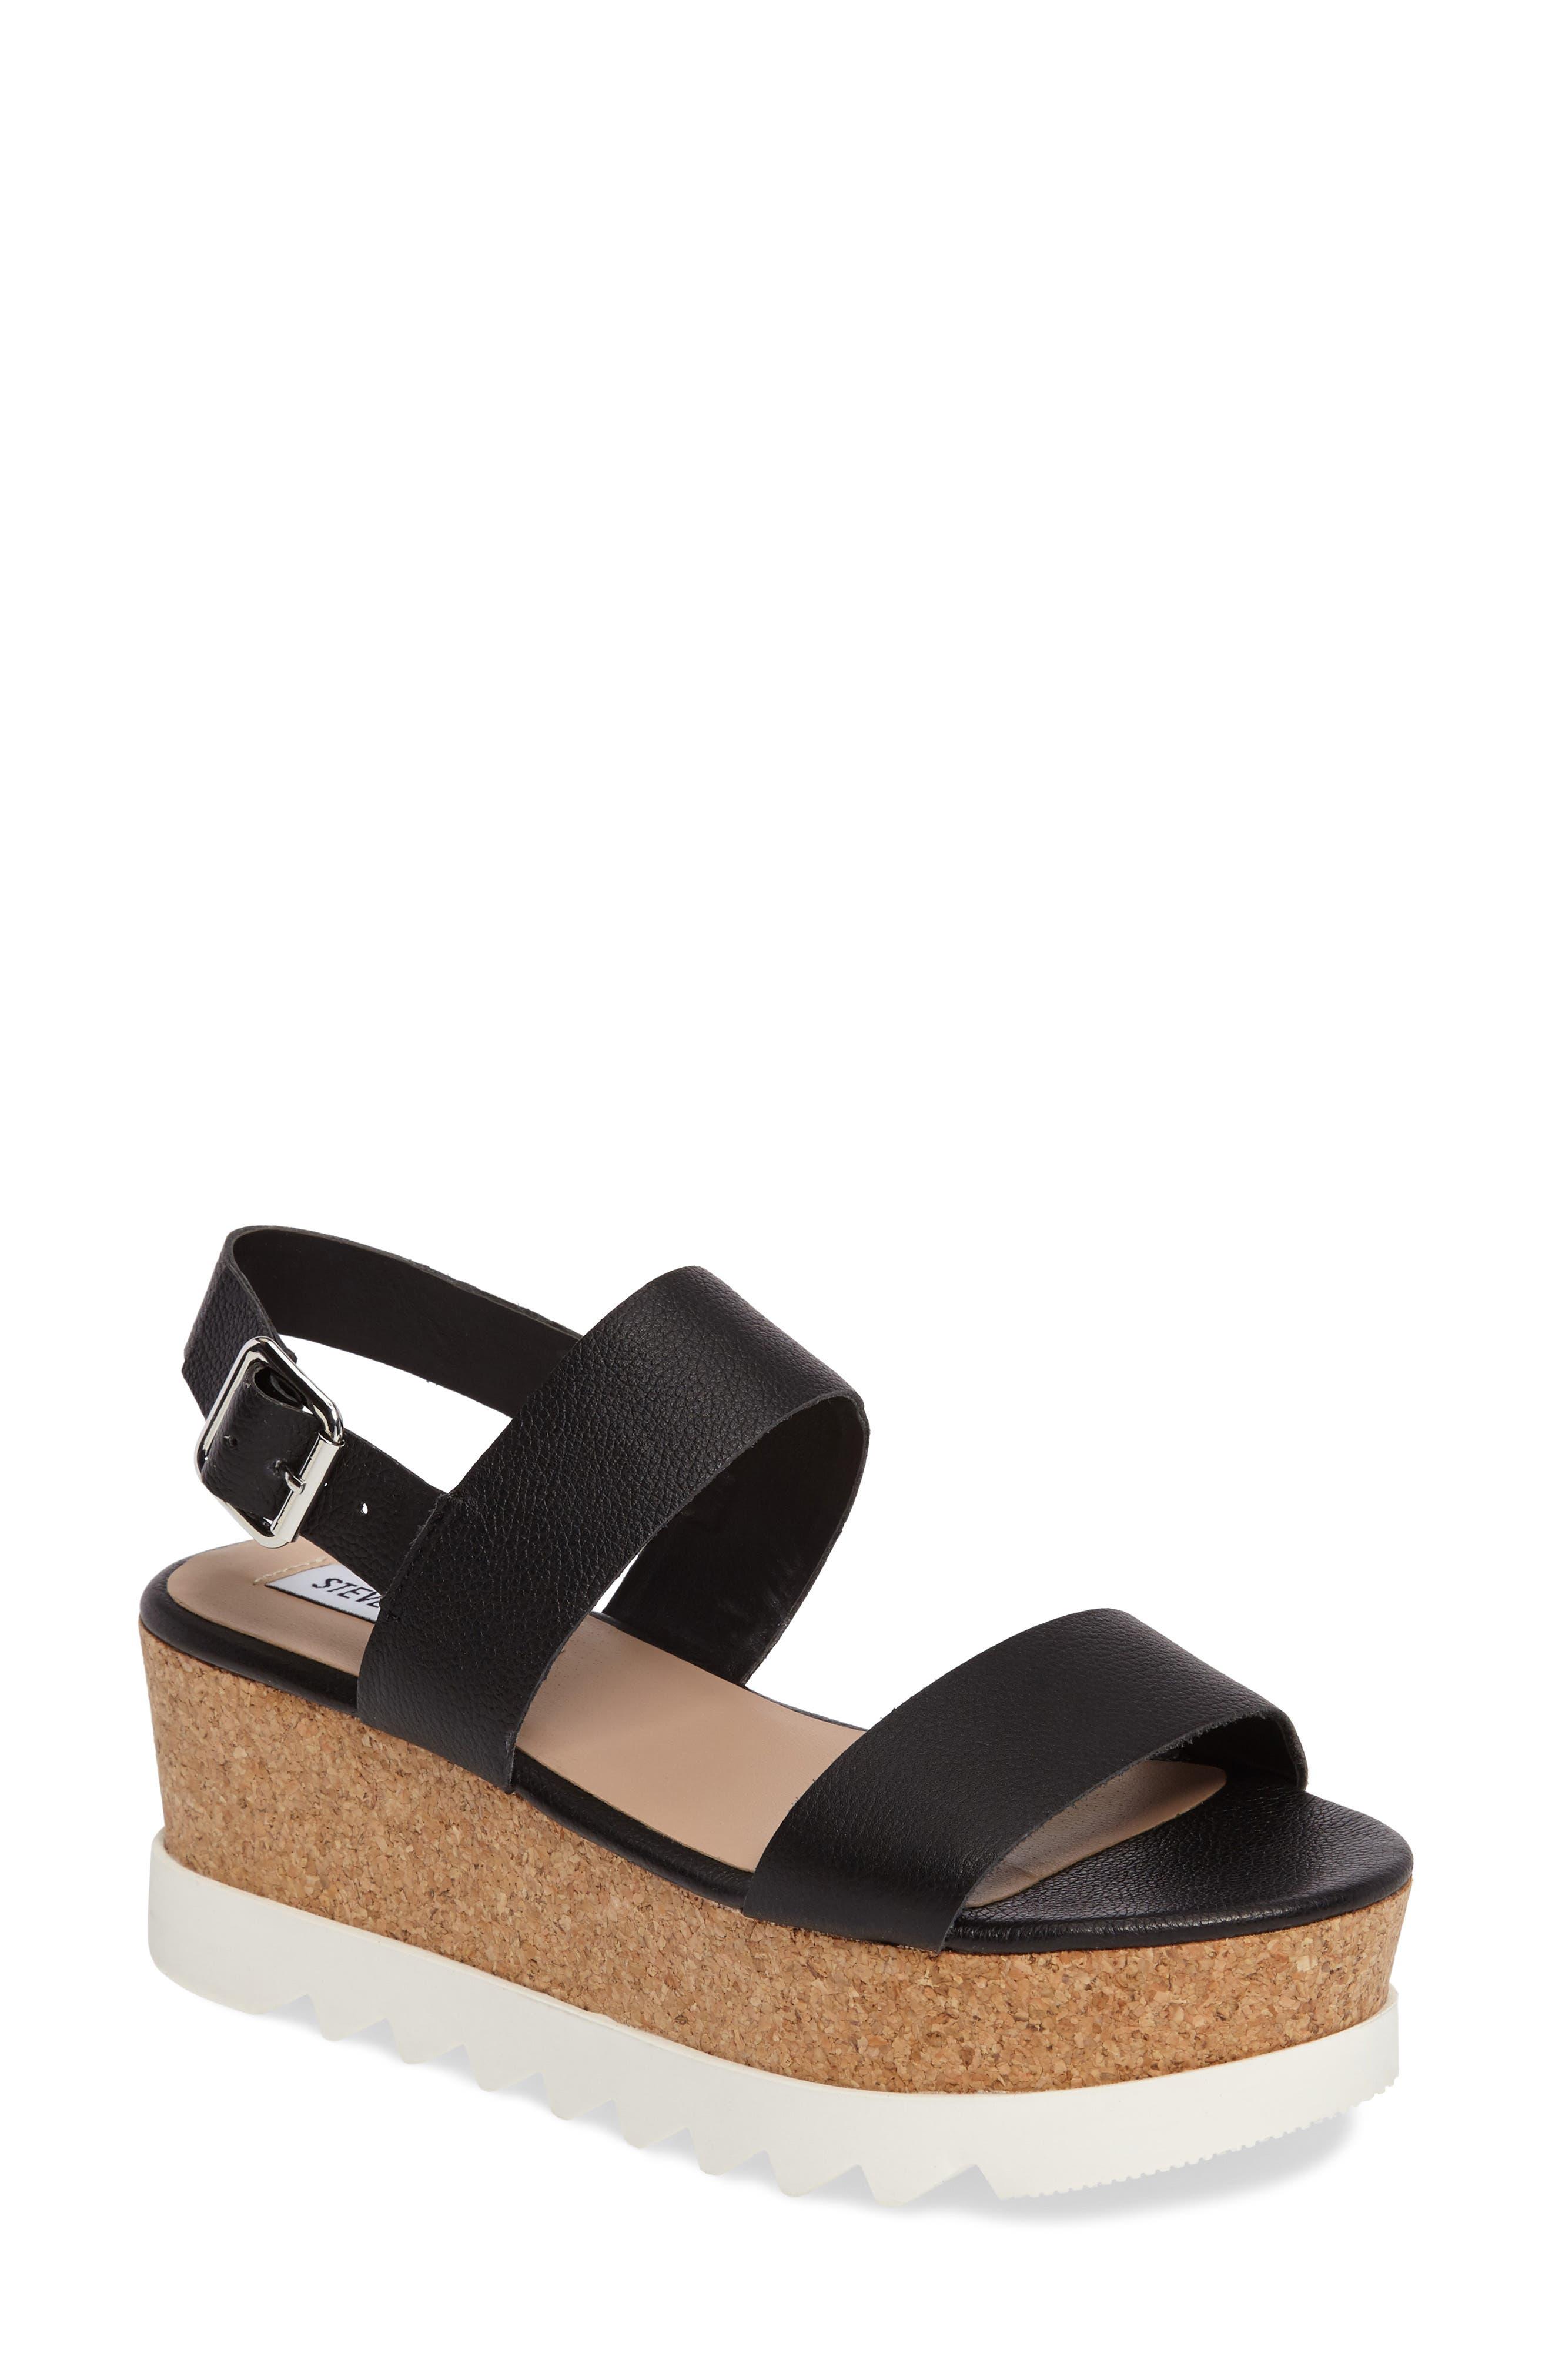 Krista Wedge Sandal,                         Main,                         color, Black Leather